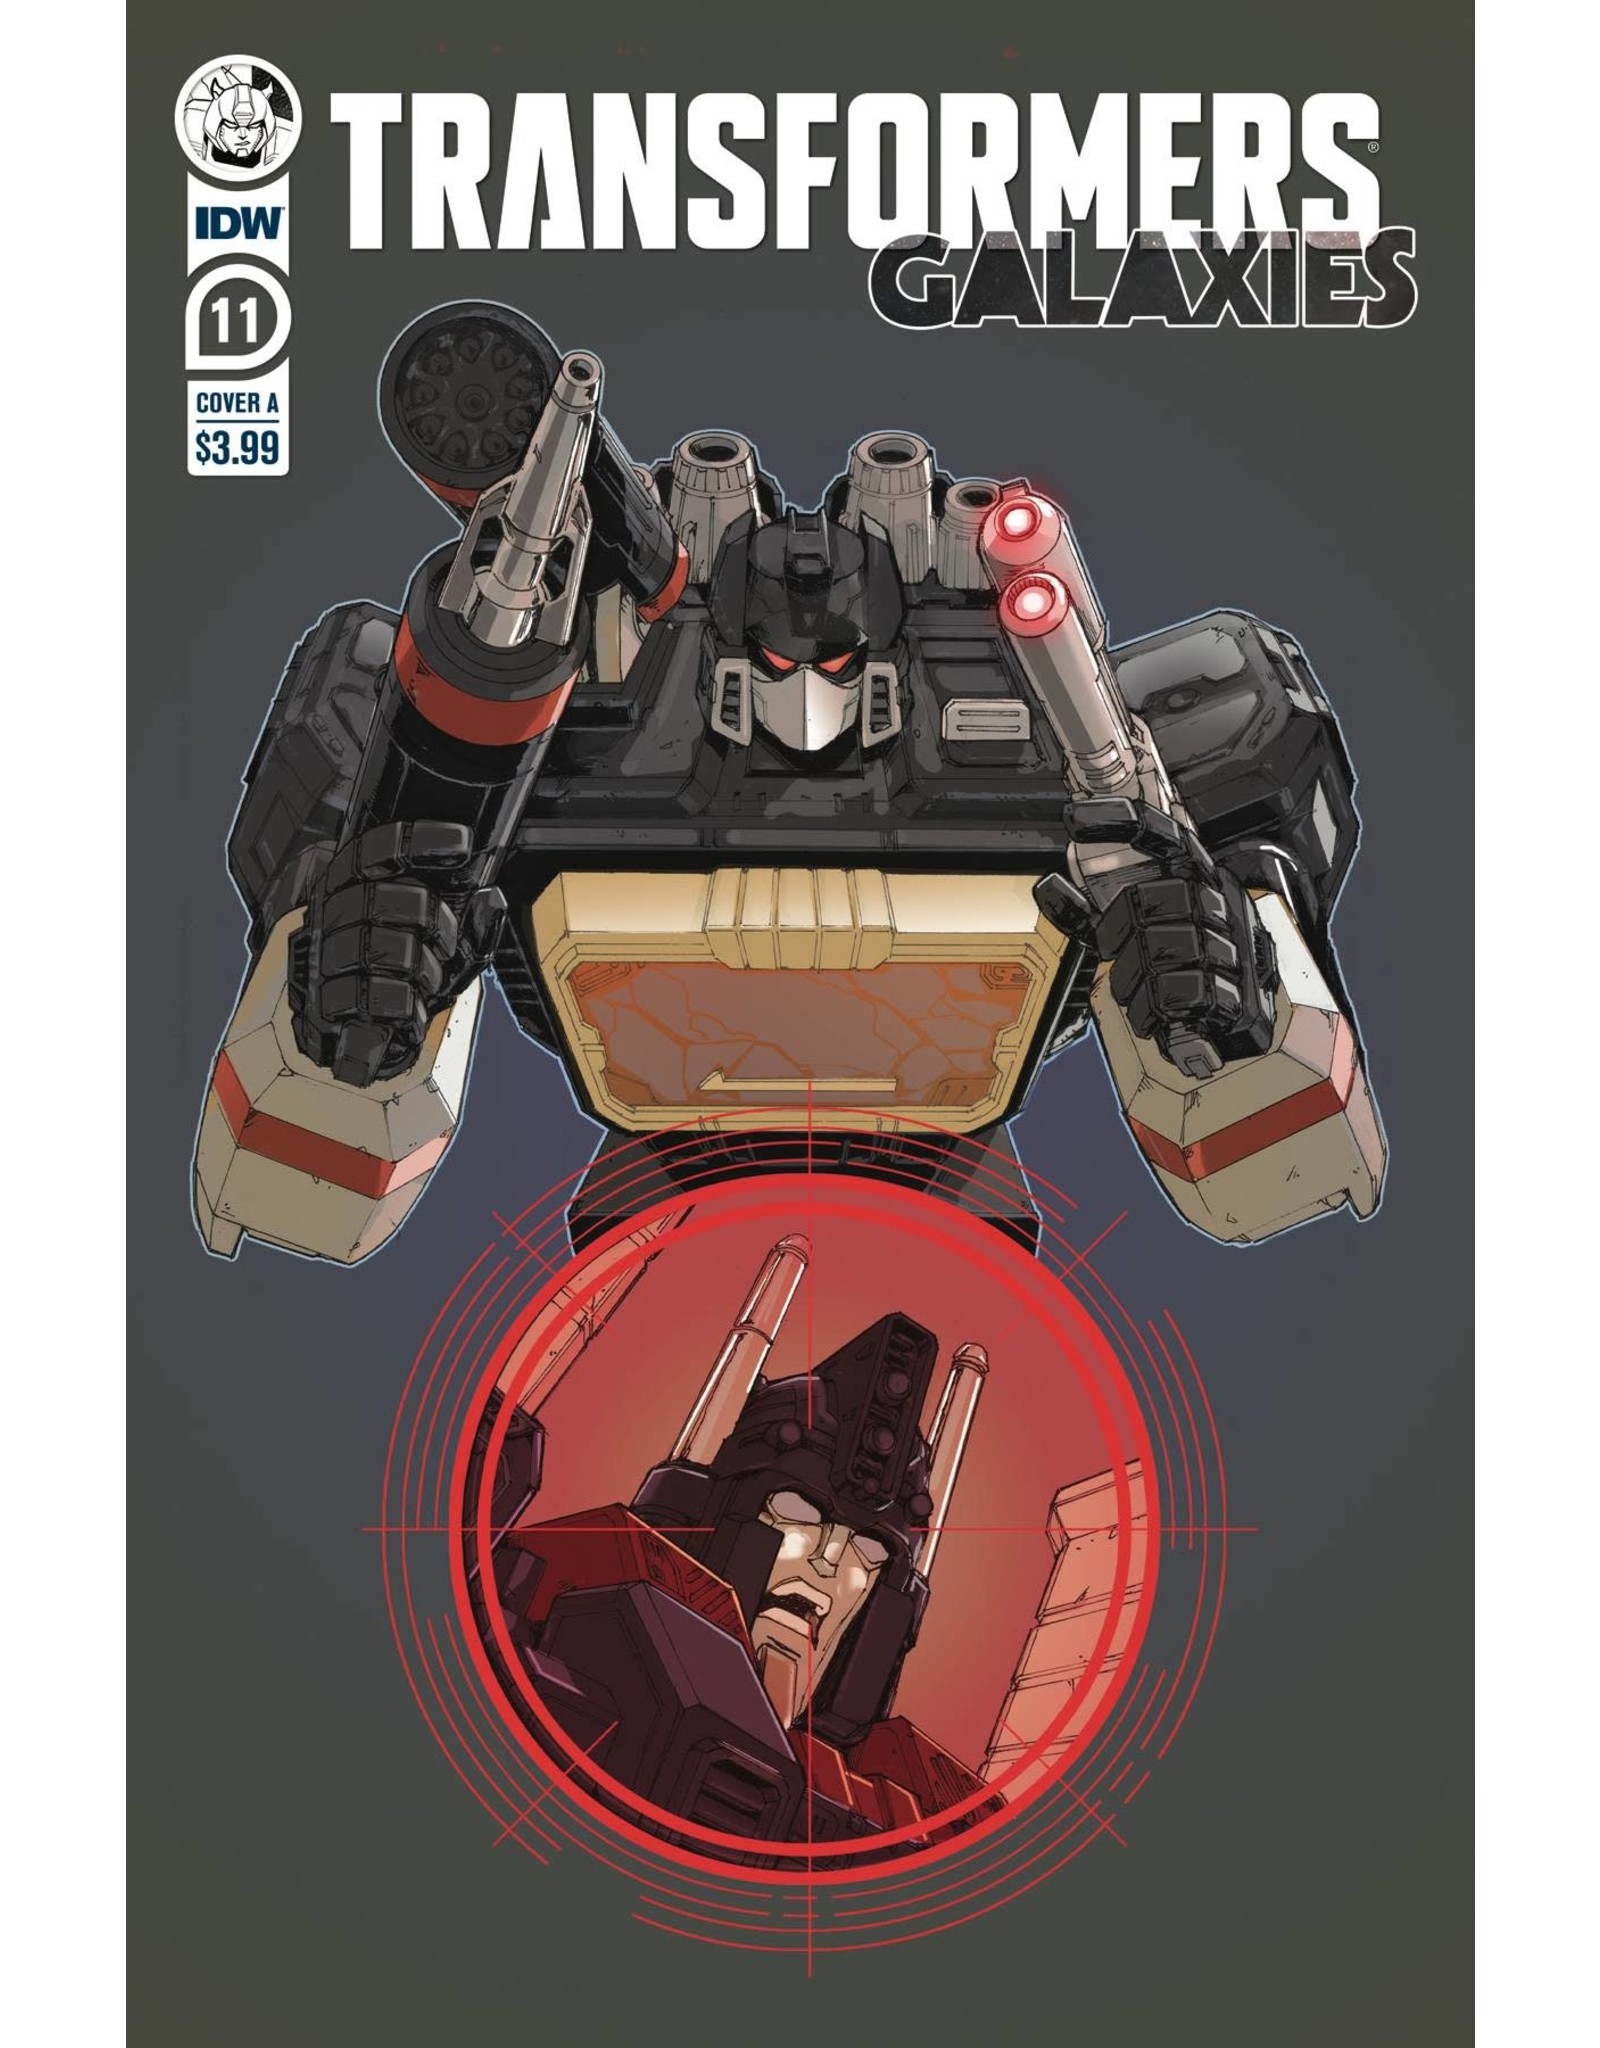 IDW PUBLISHING TRANSFORMERS GALAXIES #11 CVR A GRIFFITH